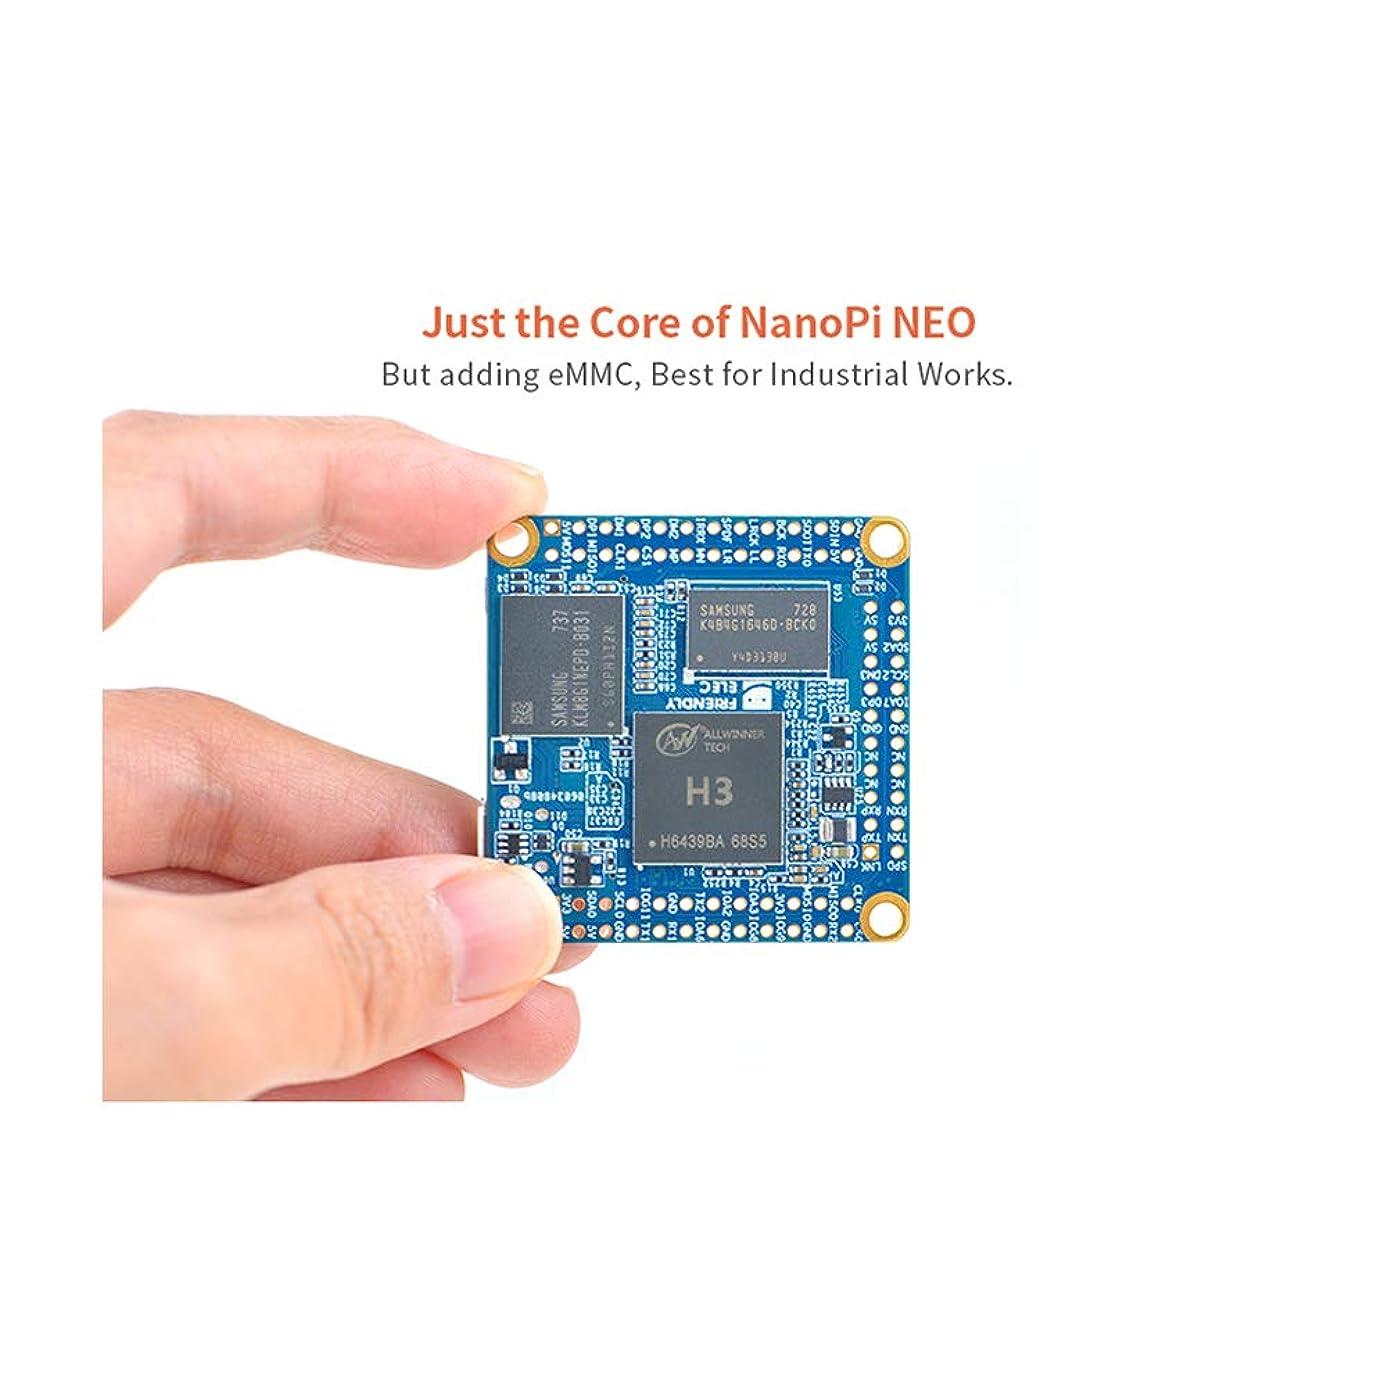 NanoPi NEO/ NEO2/ Core/Core2/ NEO Air/NEO Plus2 Aluminum Heat Sink with Thermal Paste